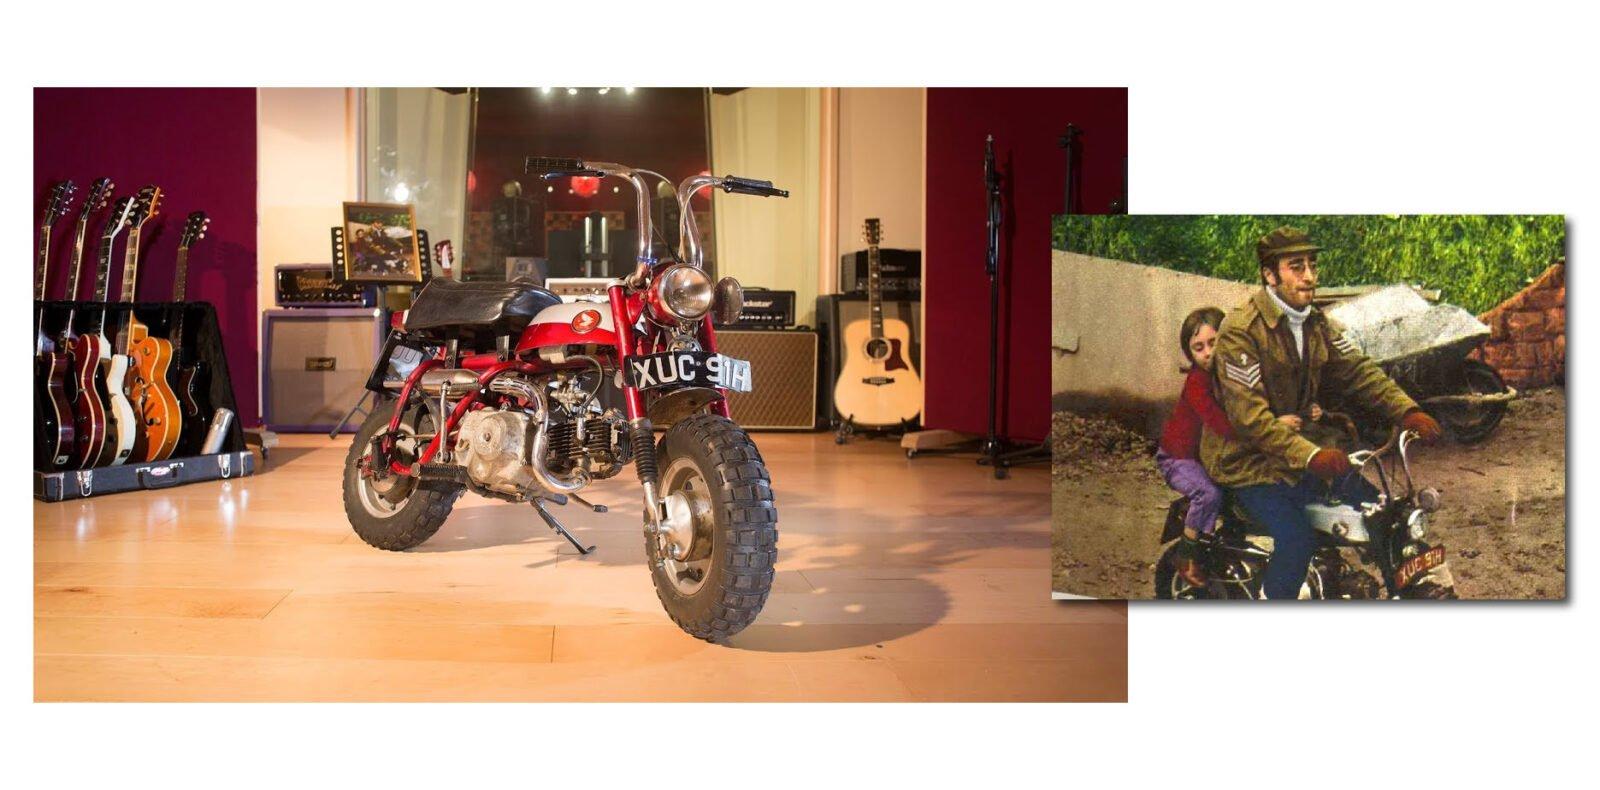 John Lennon Monkey Bike Main Image